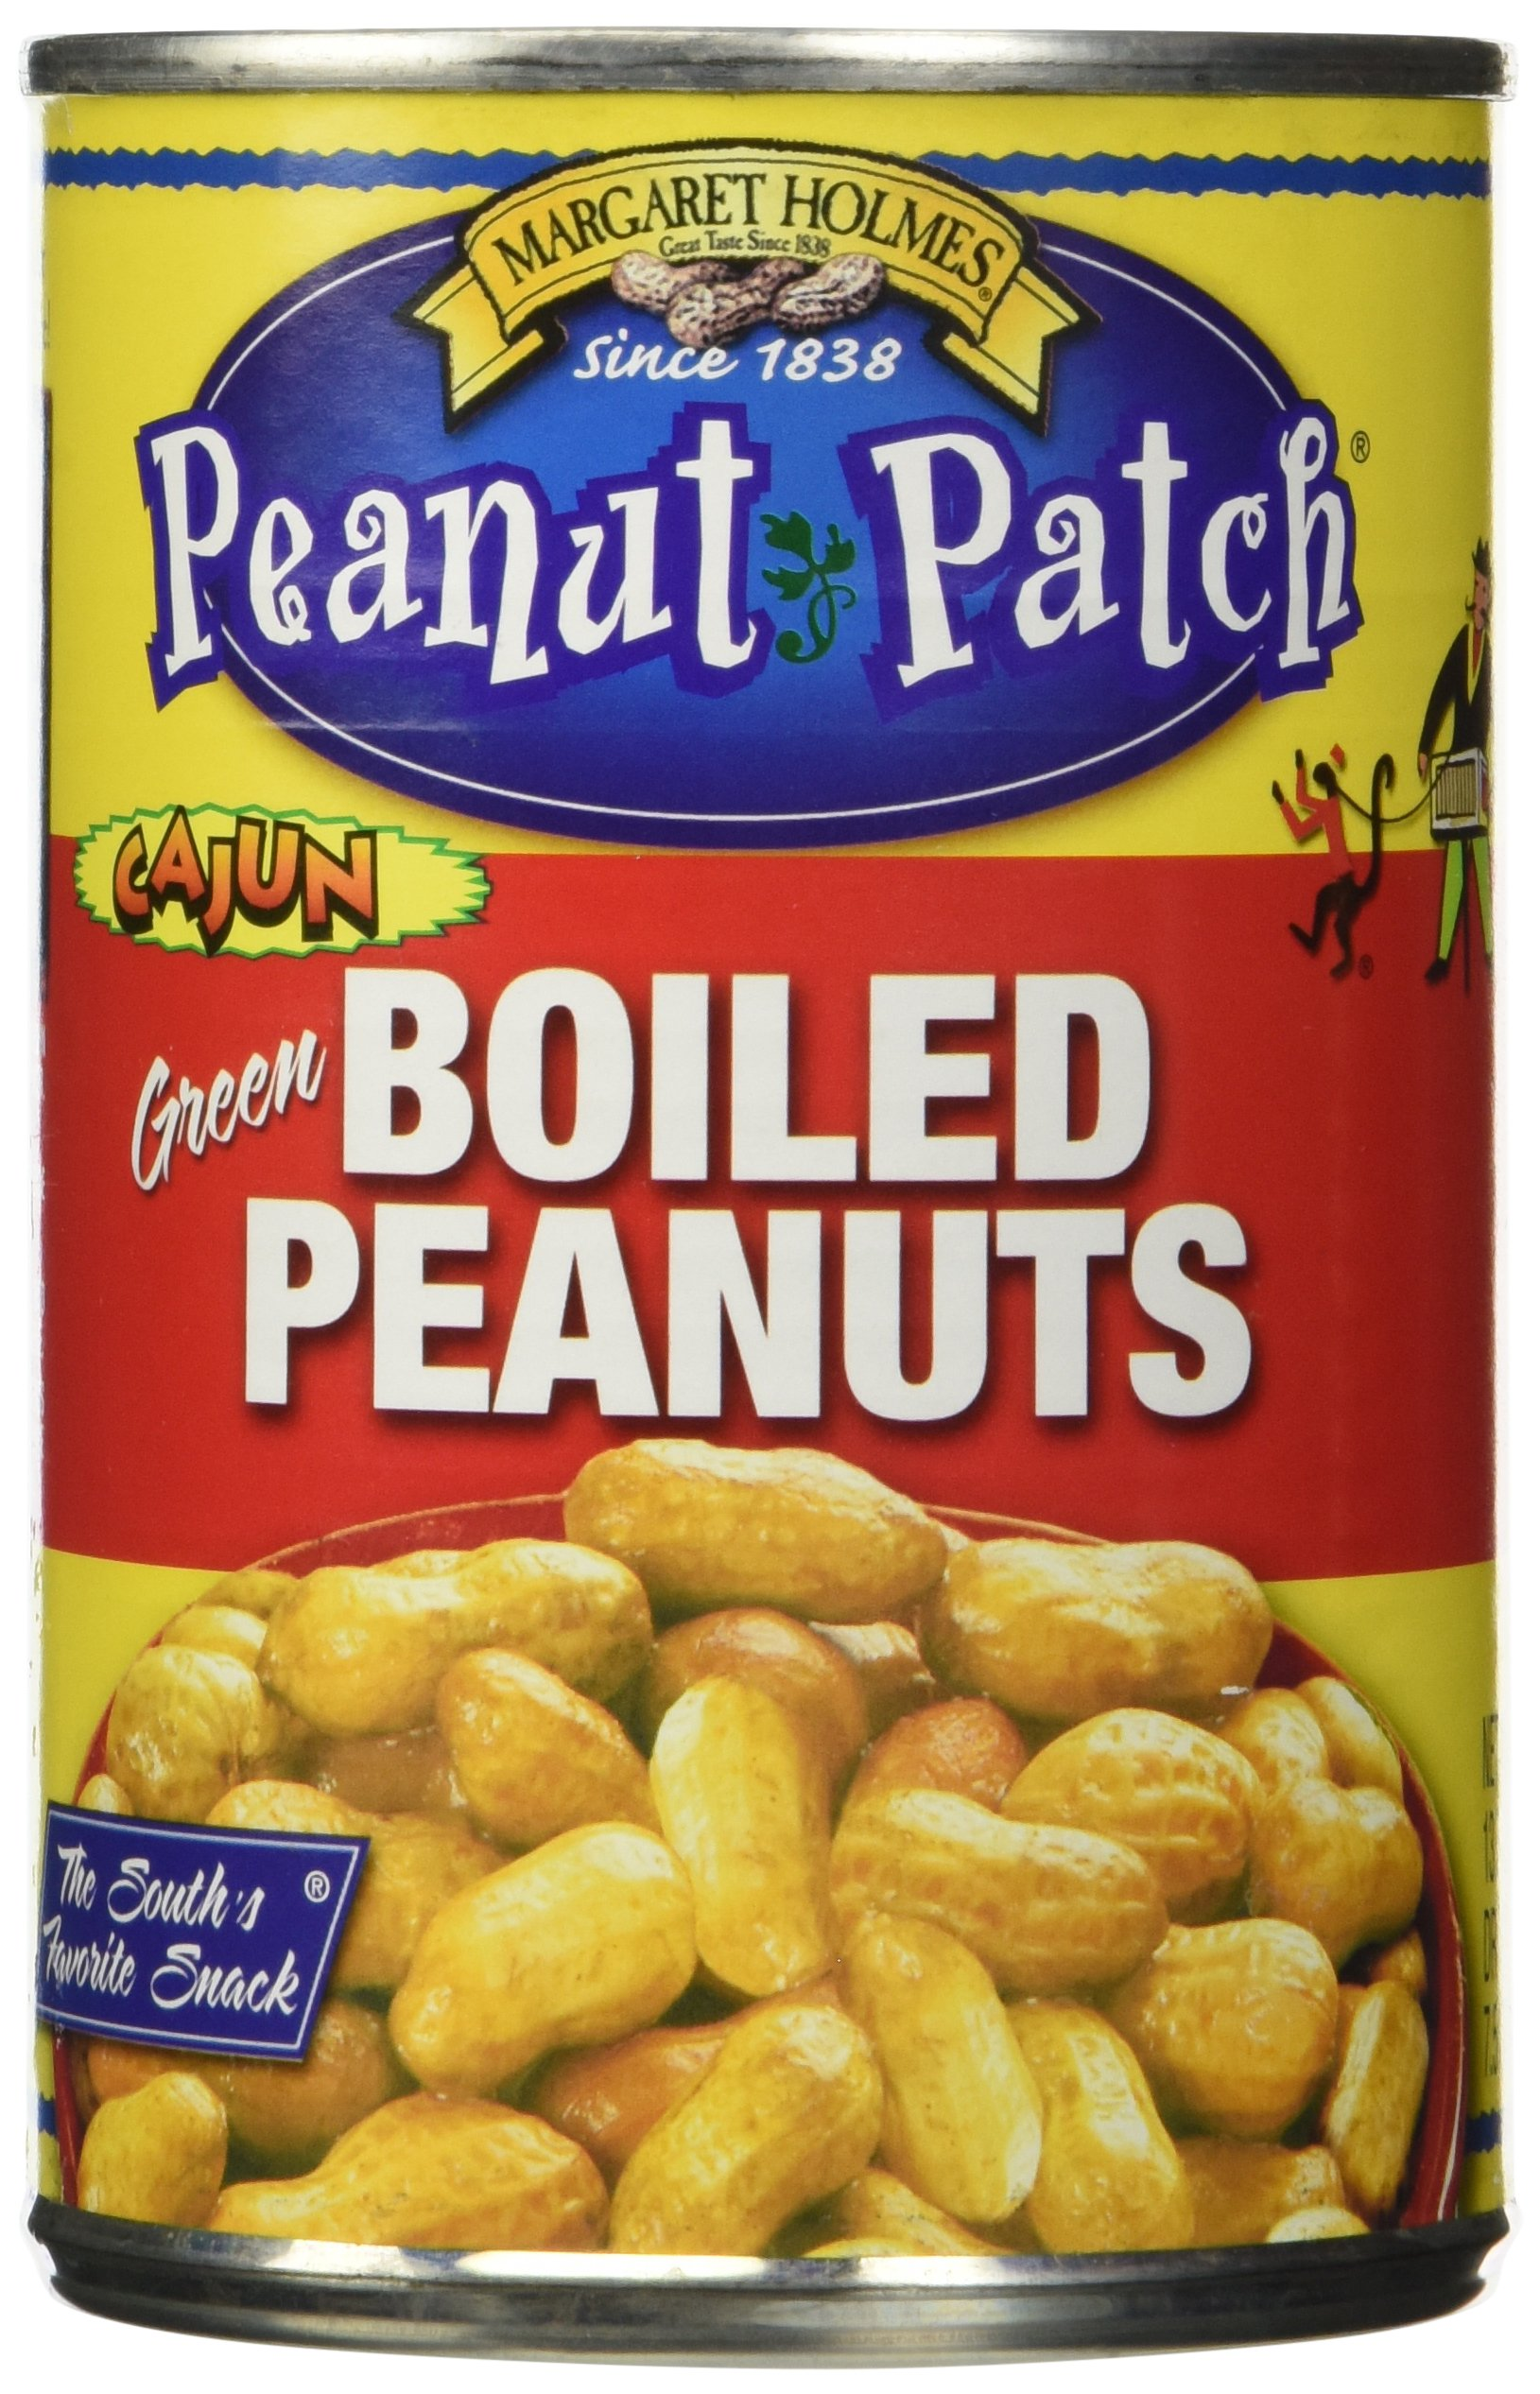 Peanut Patch Peanuts Cajun Boiled, 3-Pack